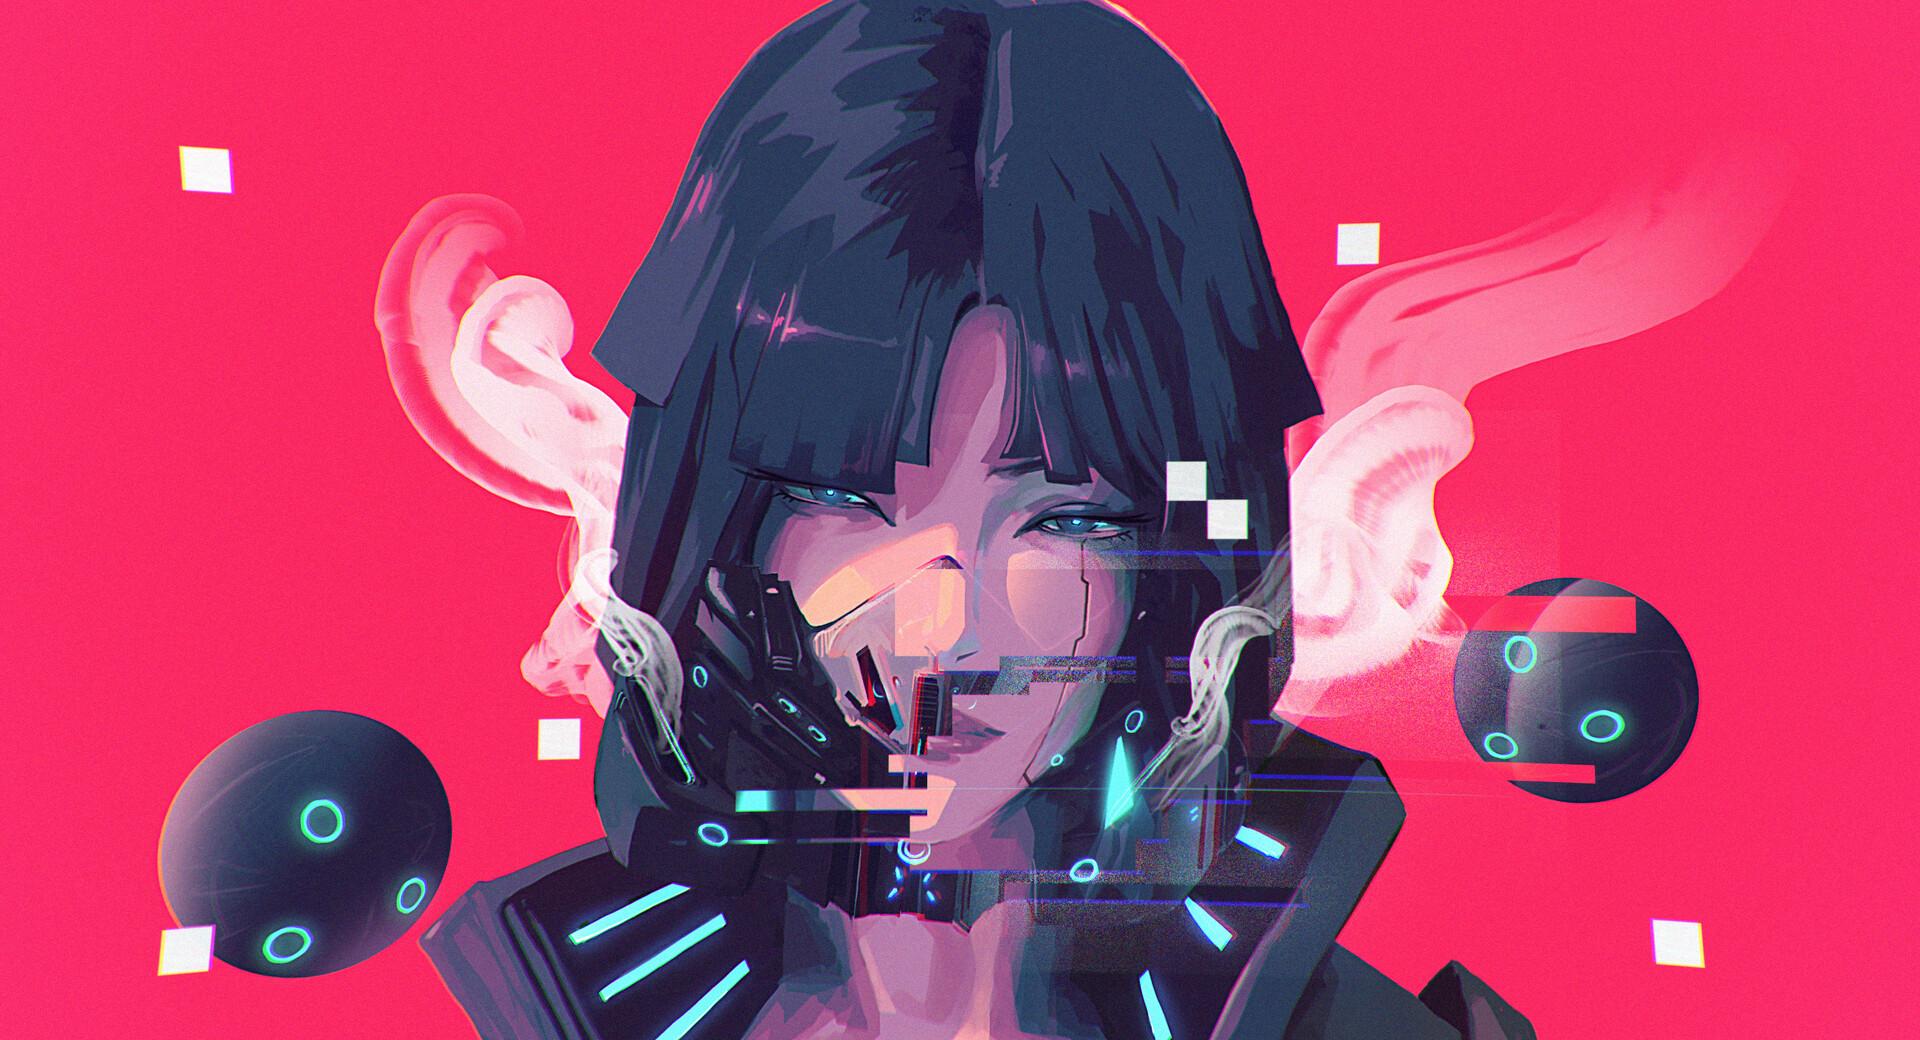 General 1920x1040 women glitch art science fiction character design  gas masks jacket leather cyberpunk Rashed AlAkroka